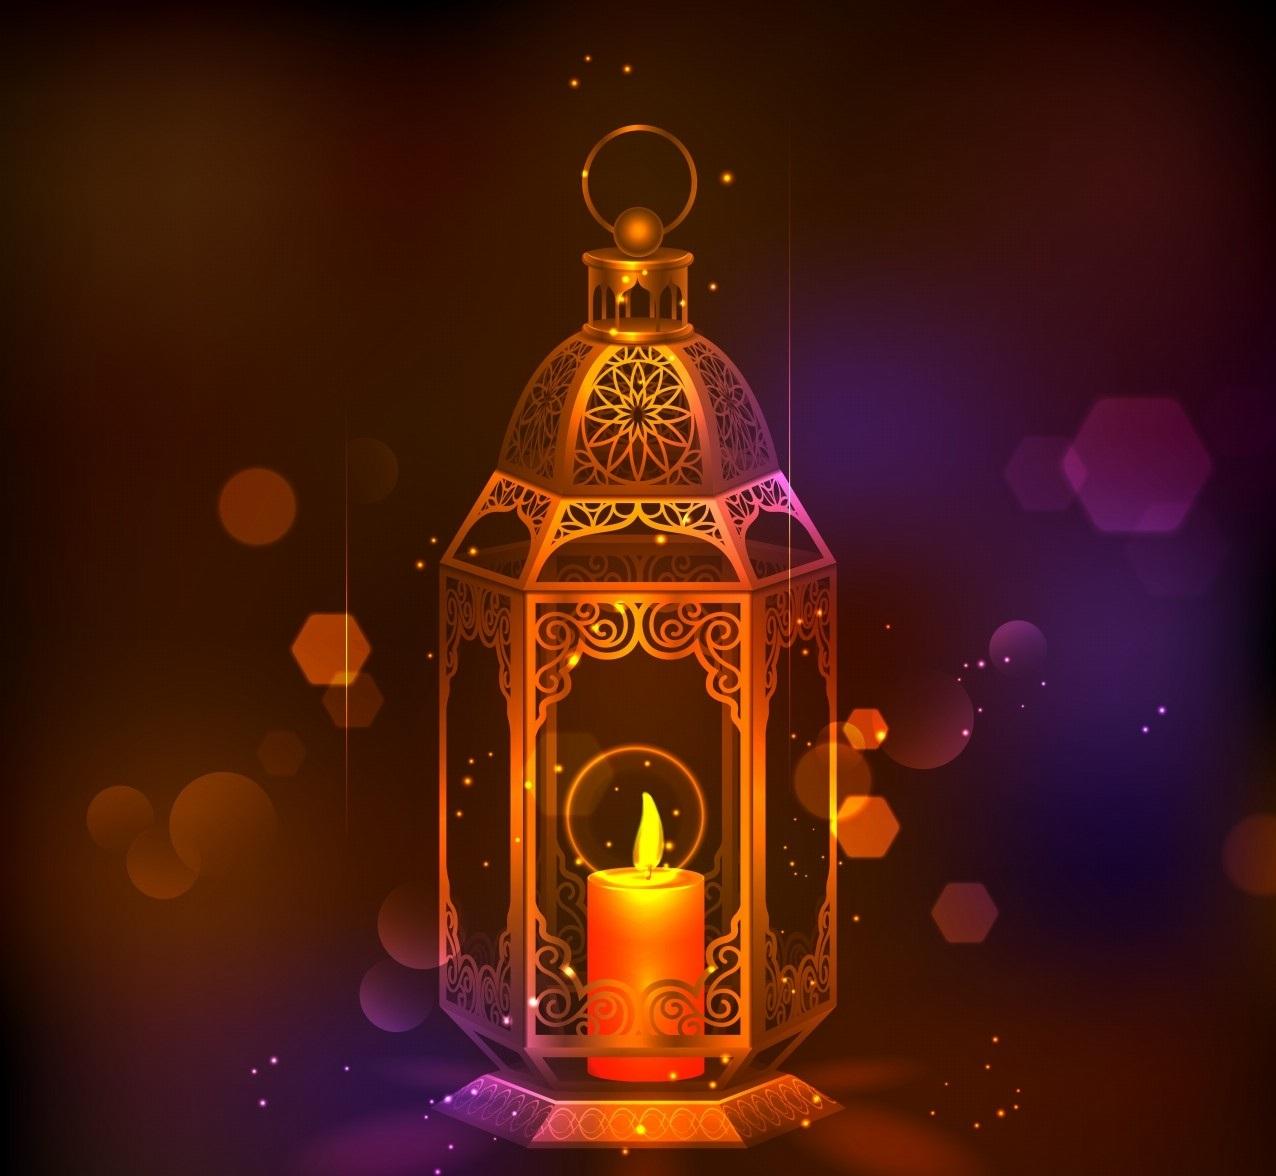 Lanterns Wallpaper Hd فانوس رمضان 2019 احدث اشكال فانوس رمضان سوبر كايرو